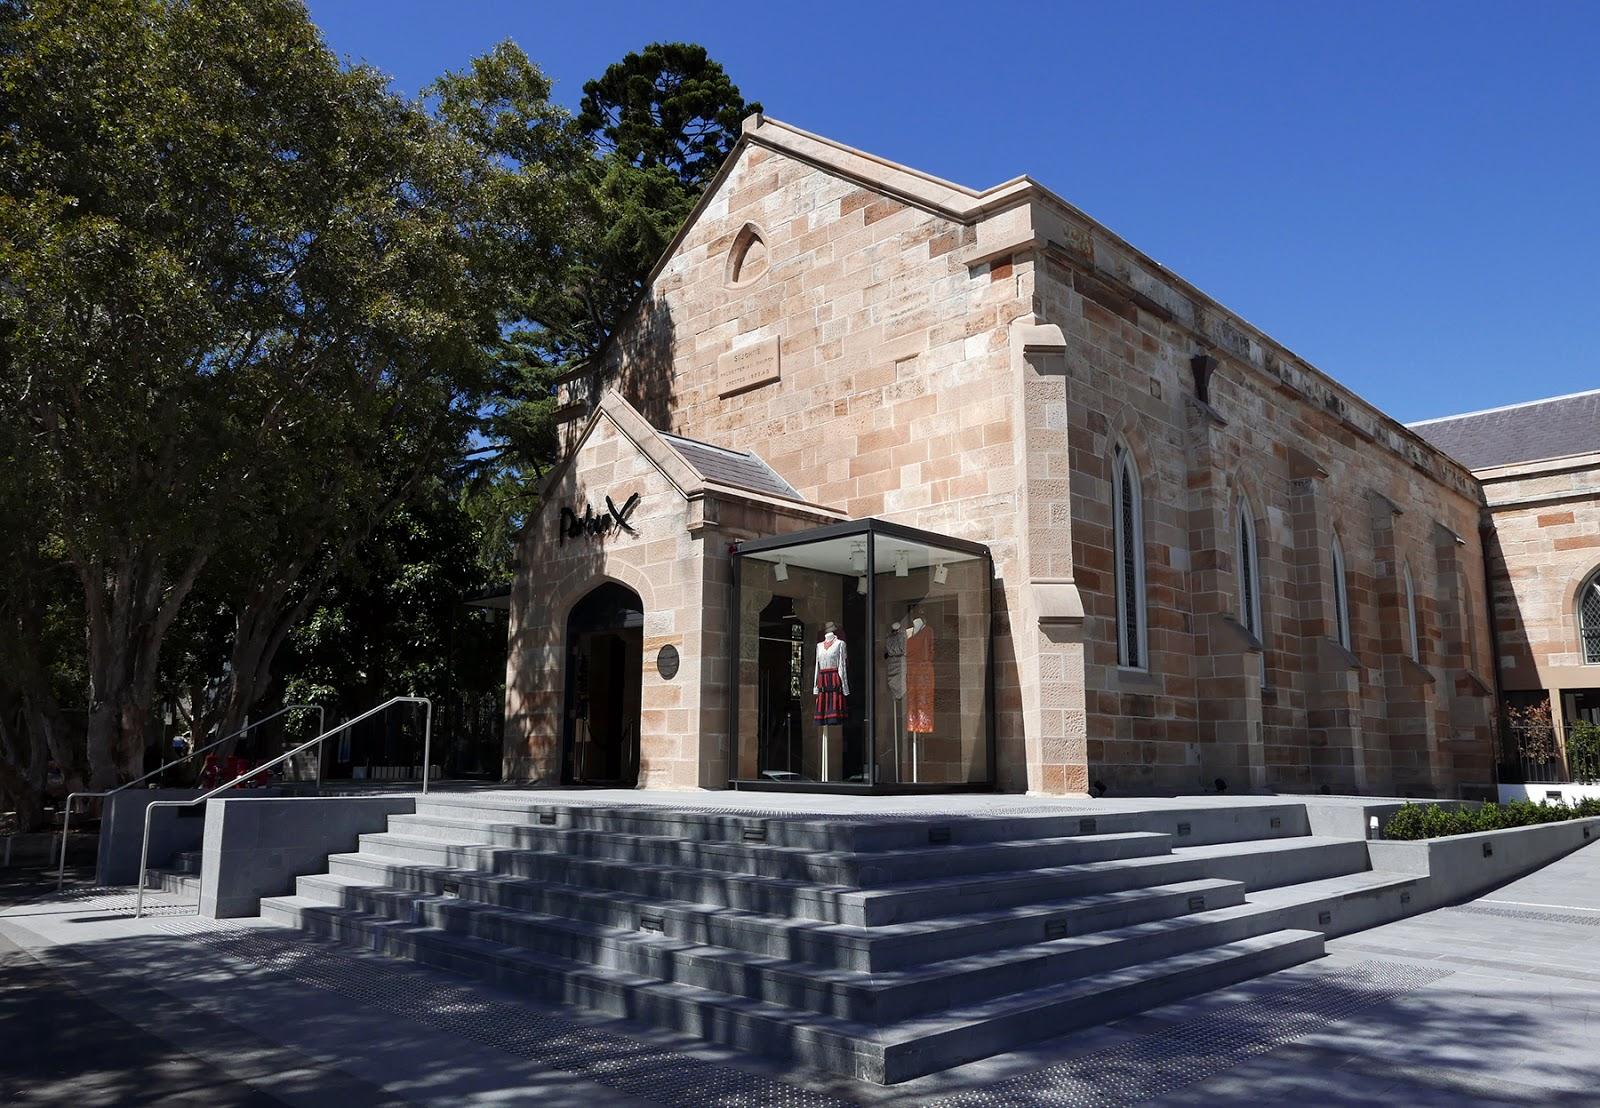 Euriental | luxury travel & style | Sydney Australia, Paddington